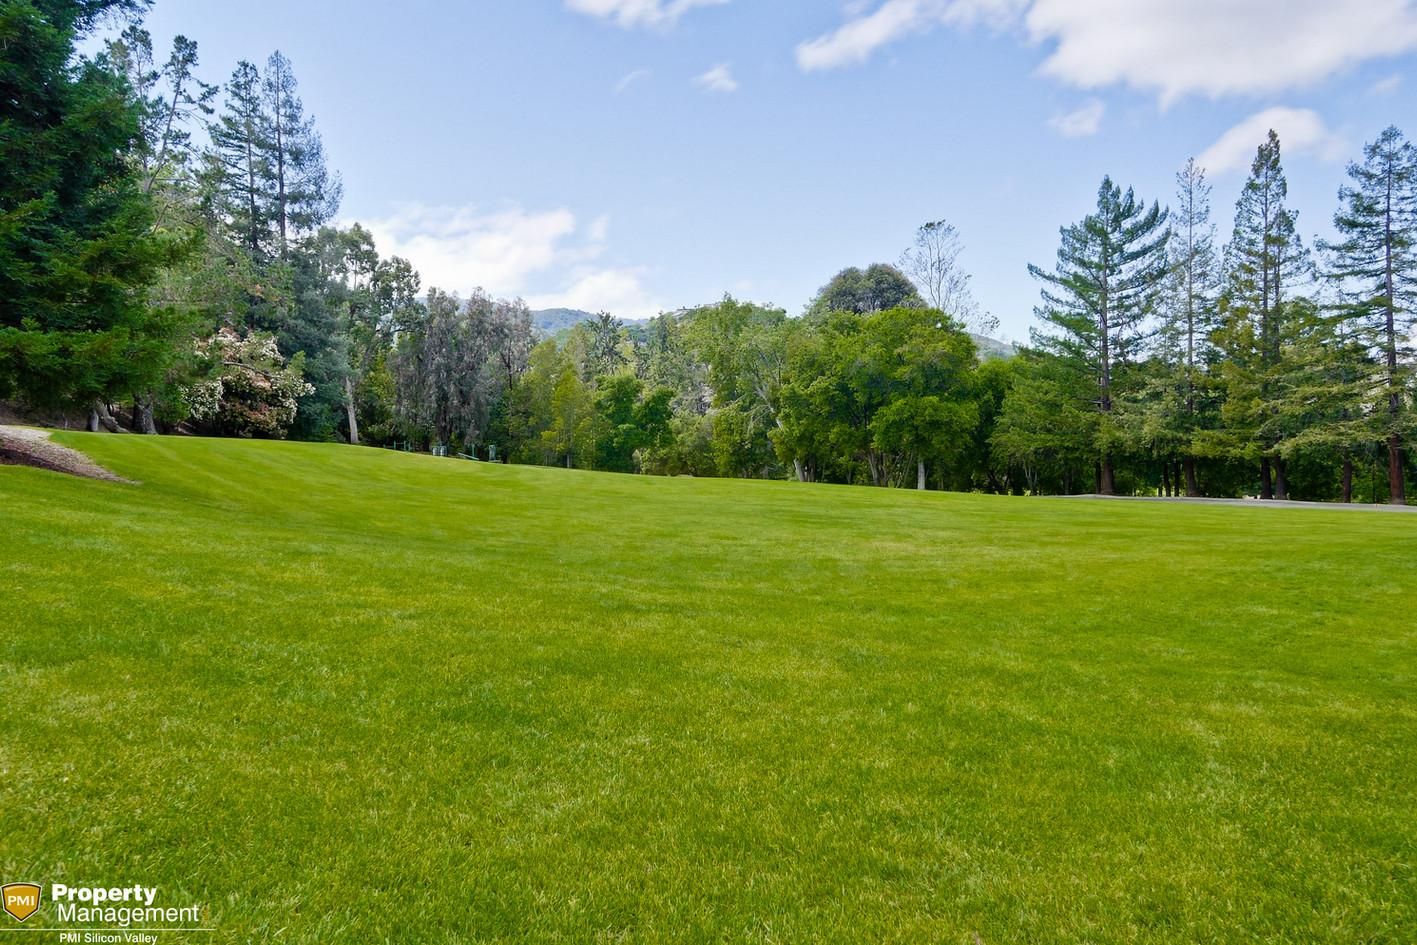 Linda Vista Park